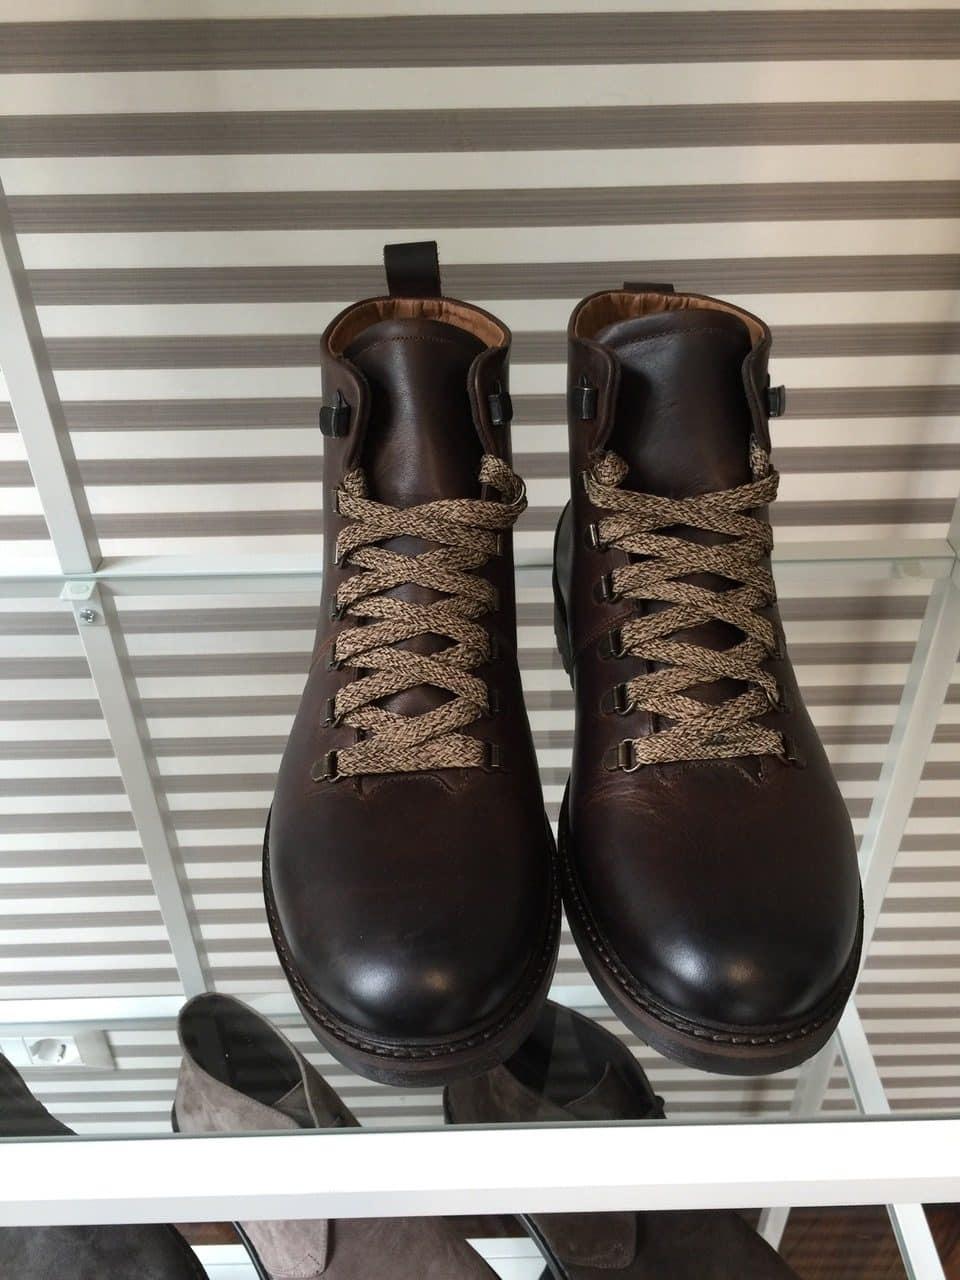 Bata uomo scarpe inverno 2018-2019